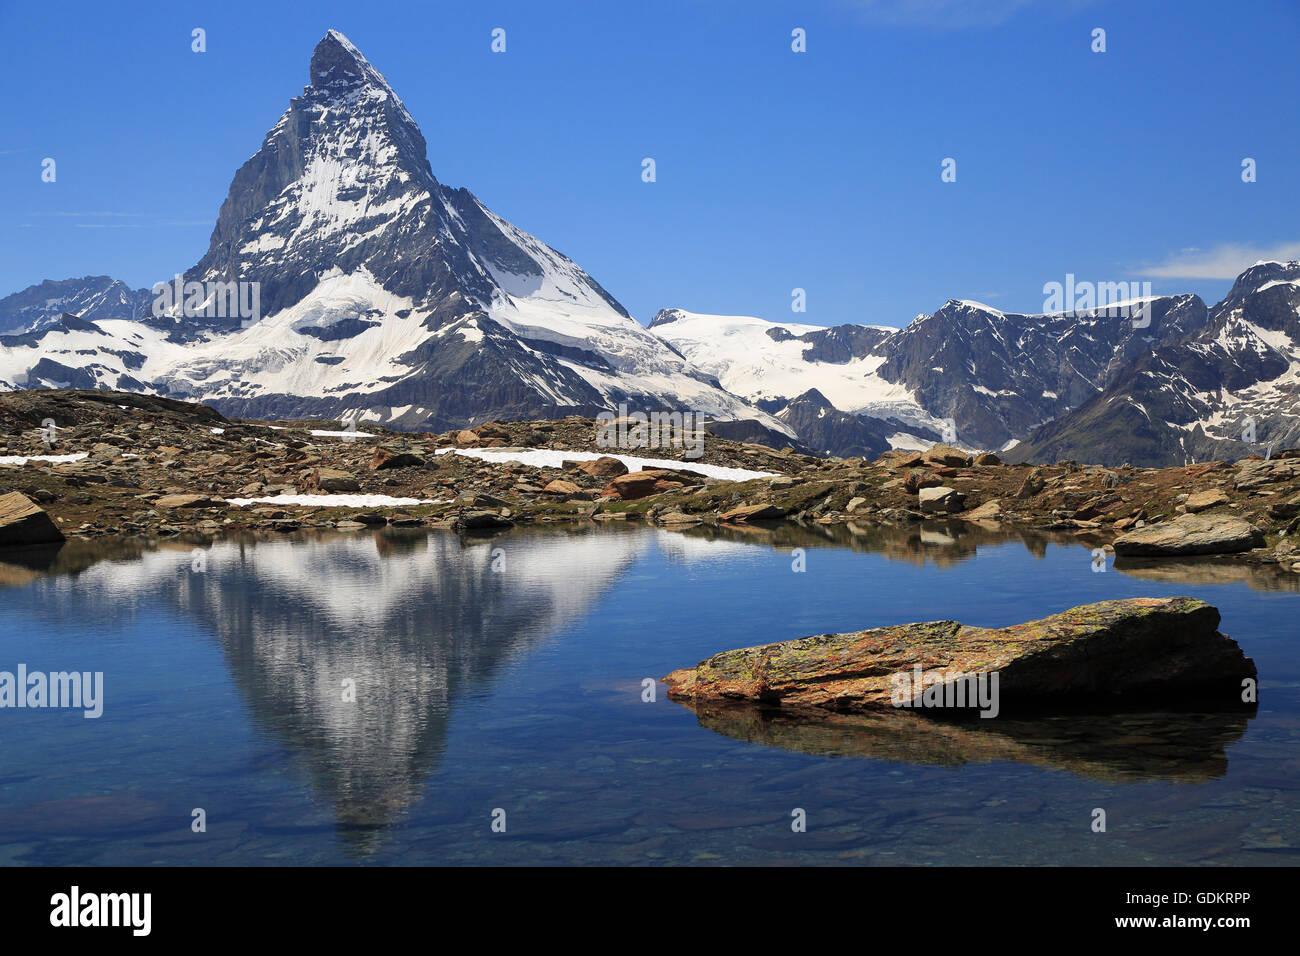 Matterhorn reflected into alpine lake, Switzerland - Stock Image